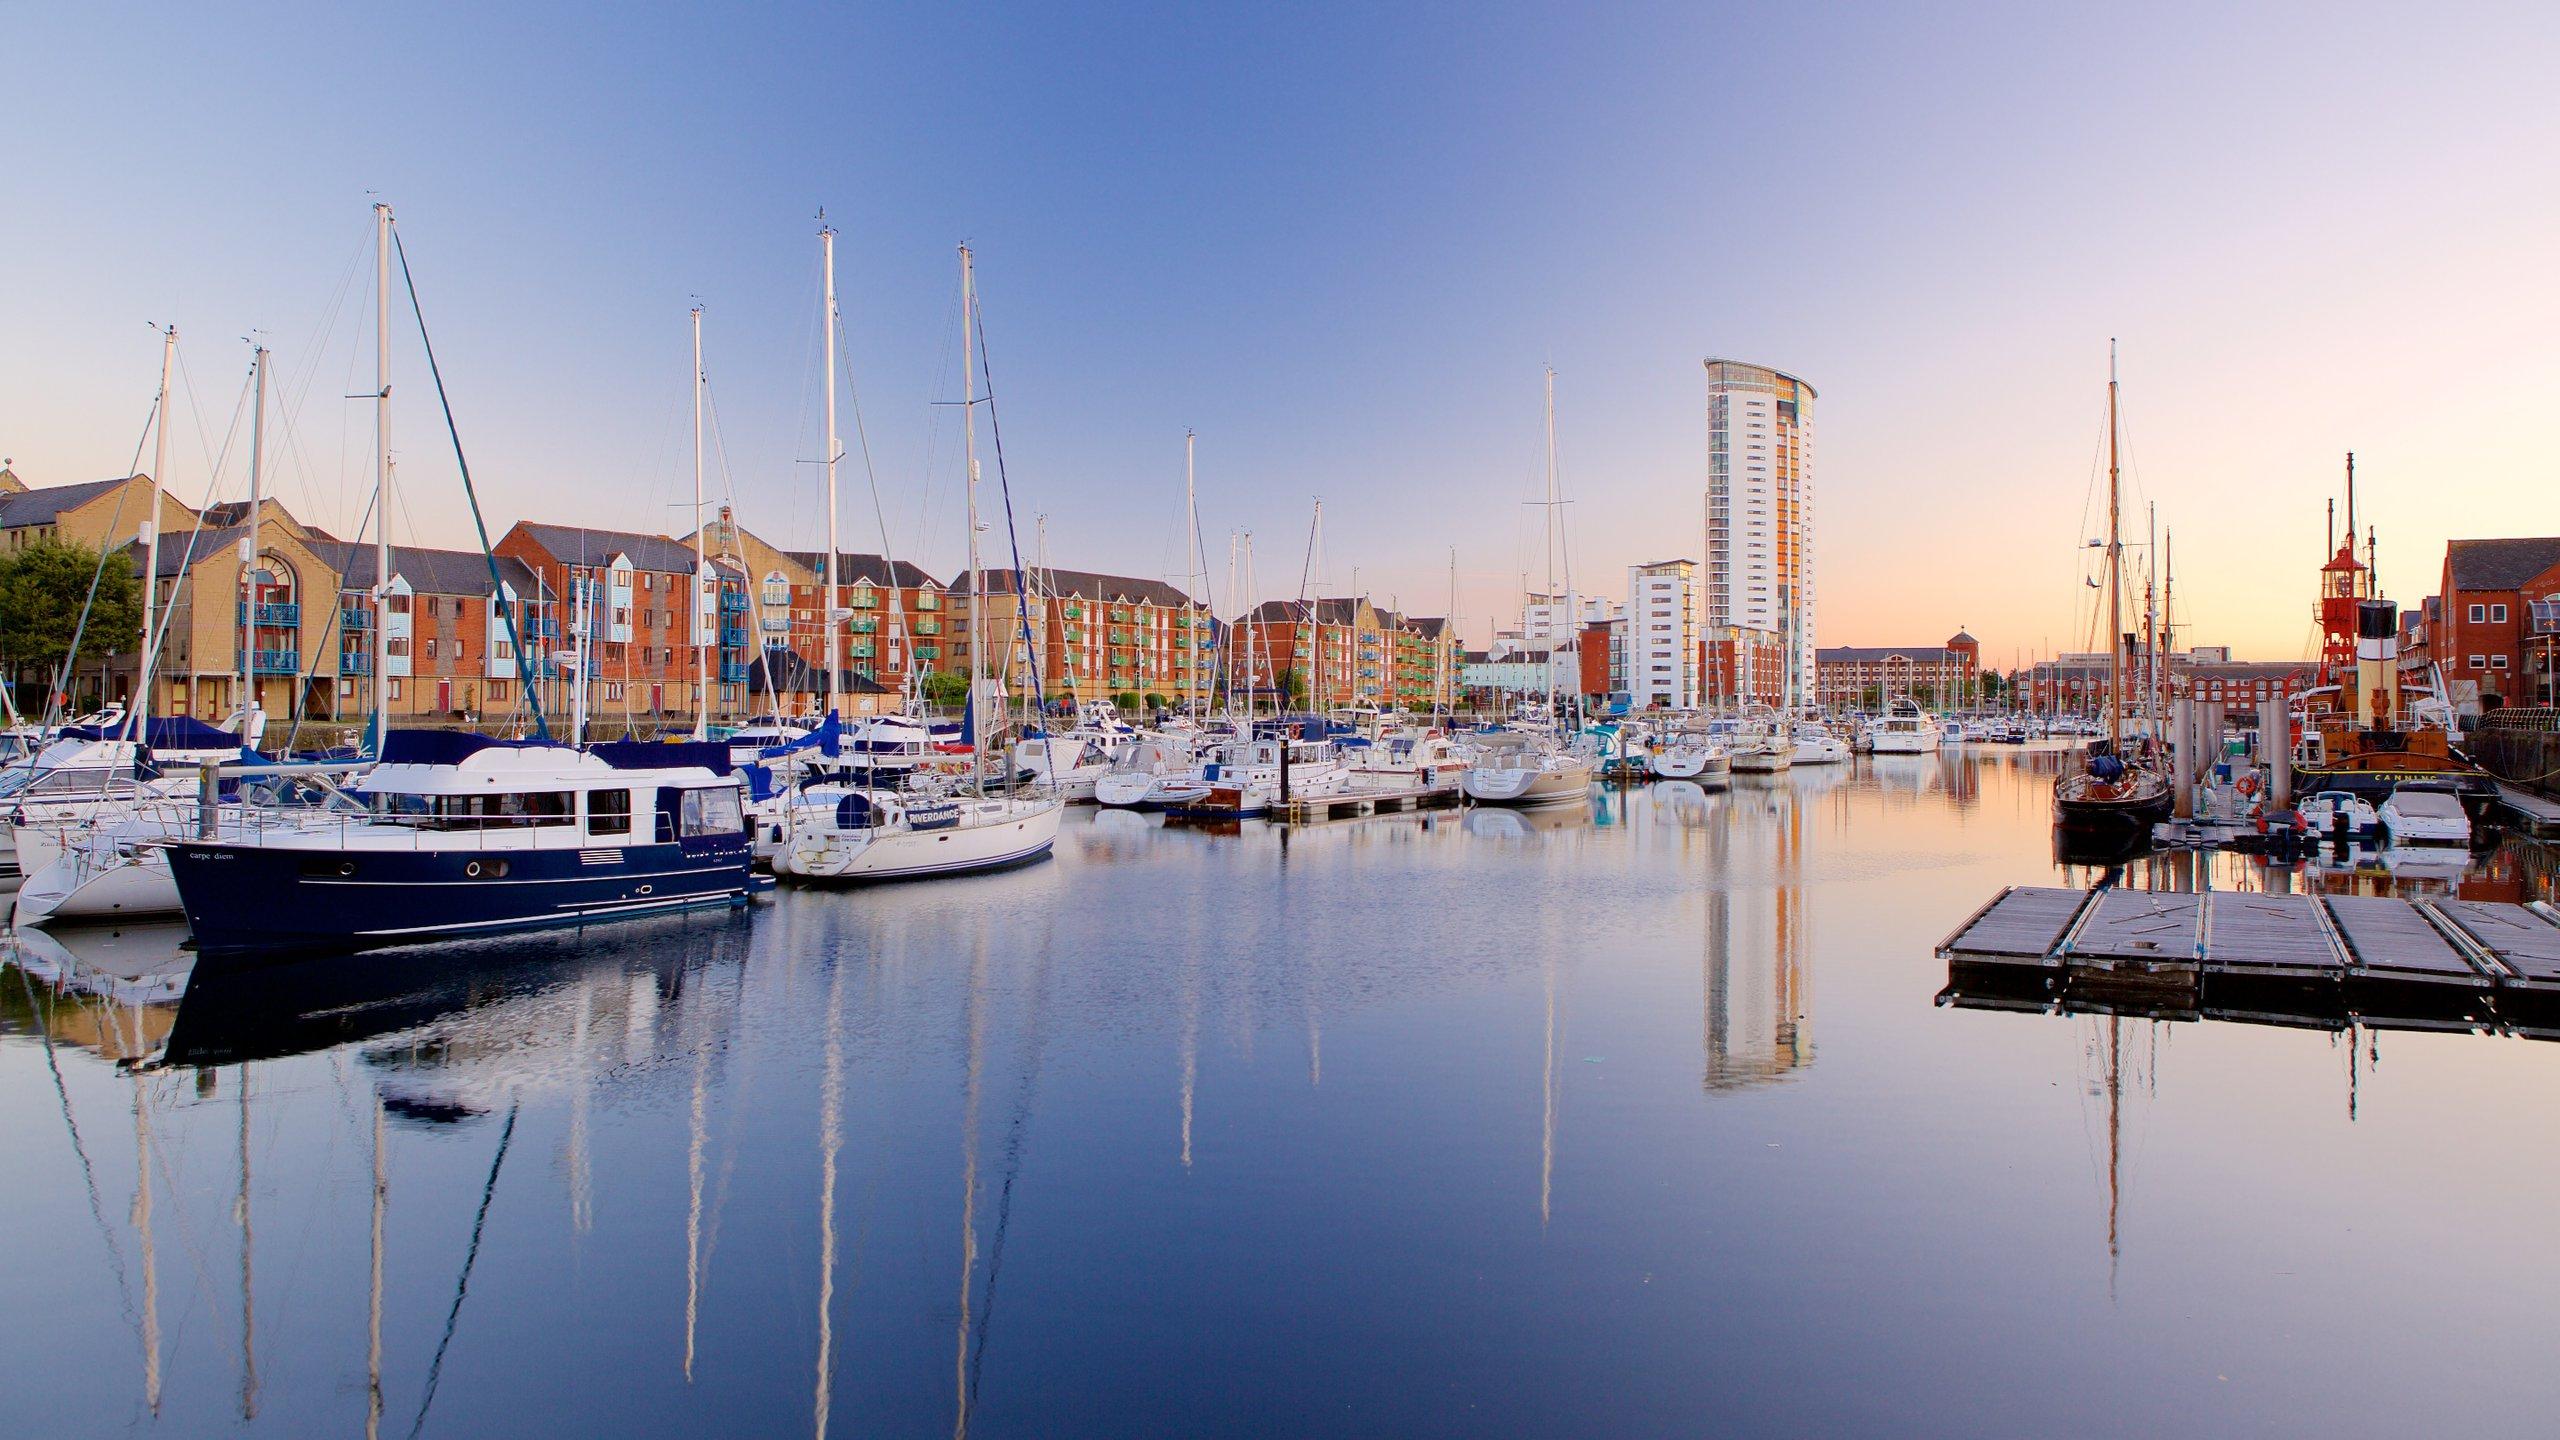 Swansea, Wales, United Kingdom